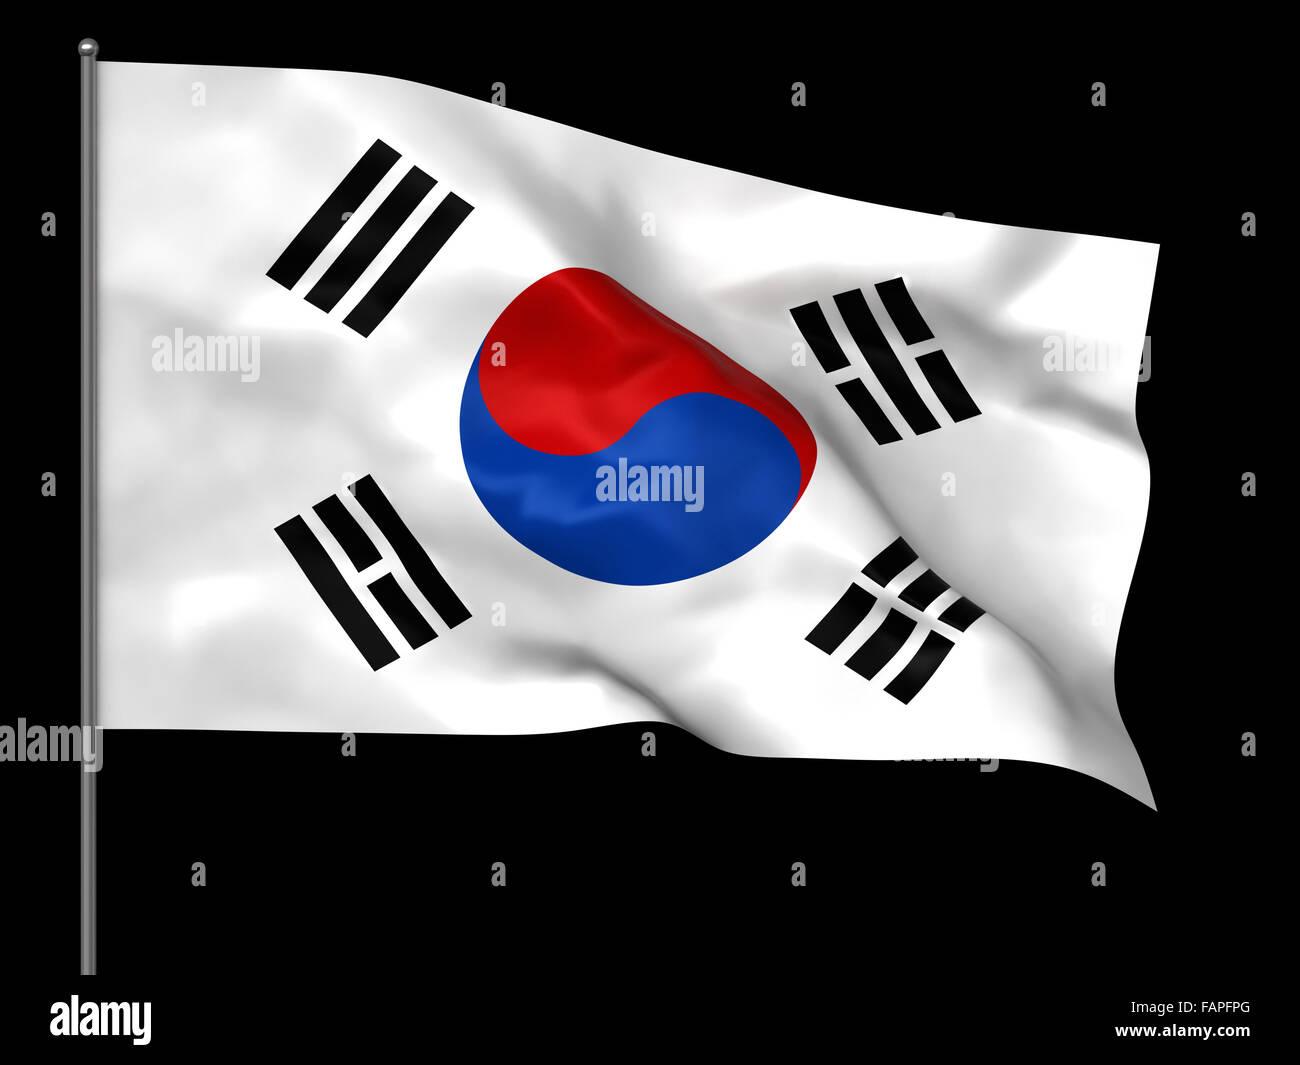 south korean flag stock photos south korean flag stock images alamy